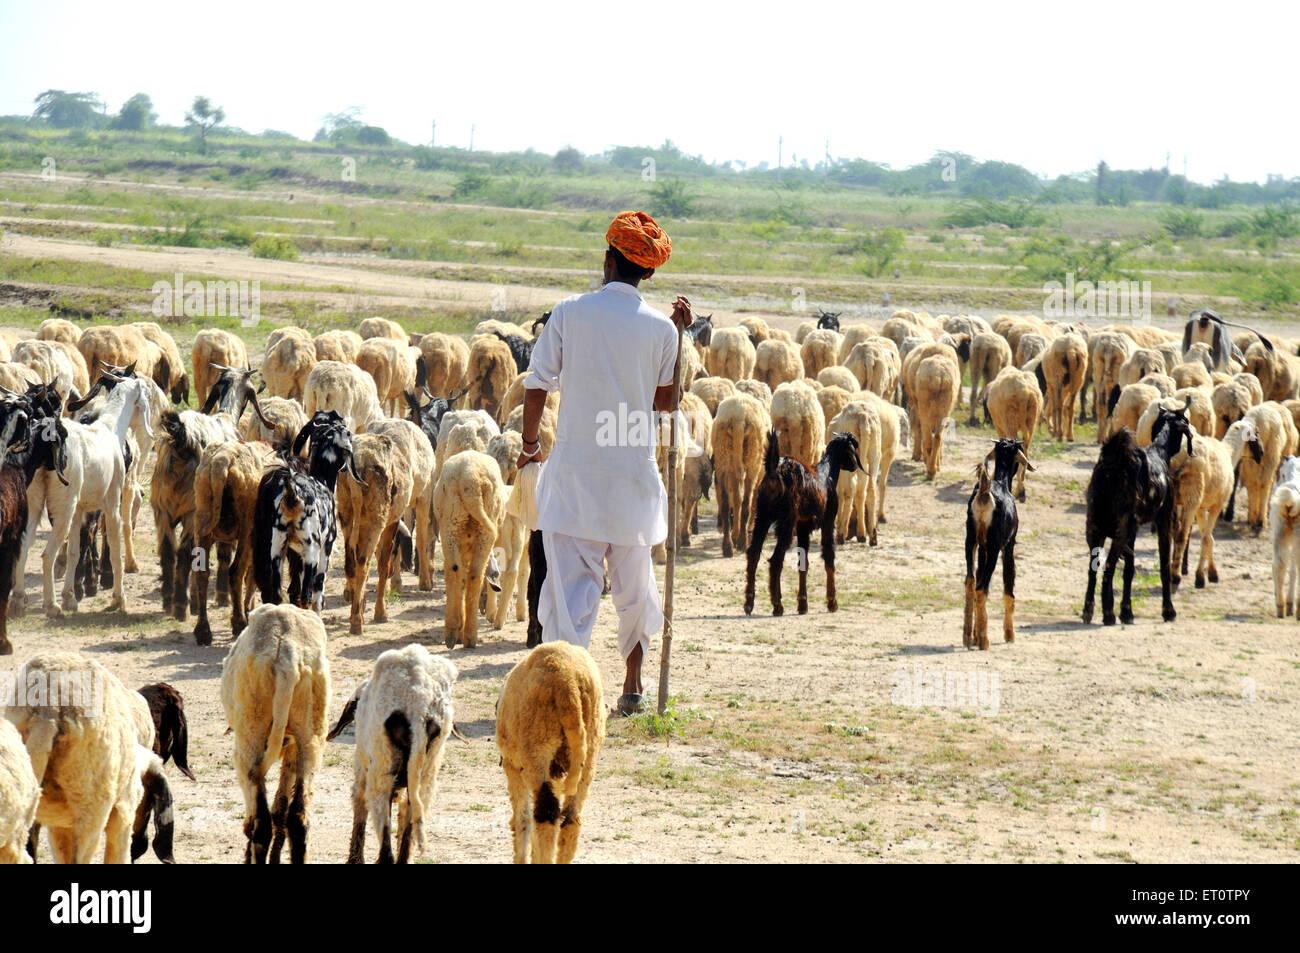 Shepherd walking with goats and sheep at pushkar ; Rajasthan ; India - Stock Image